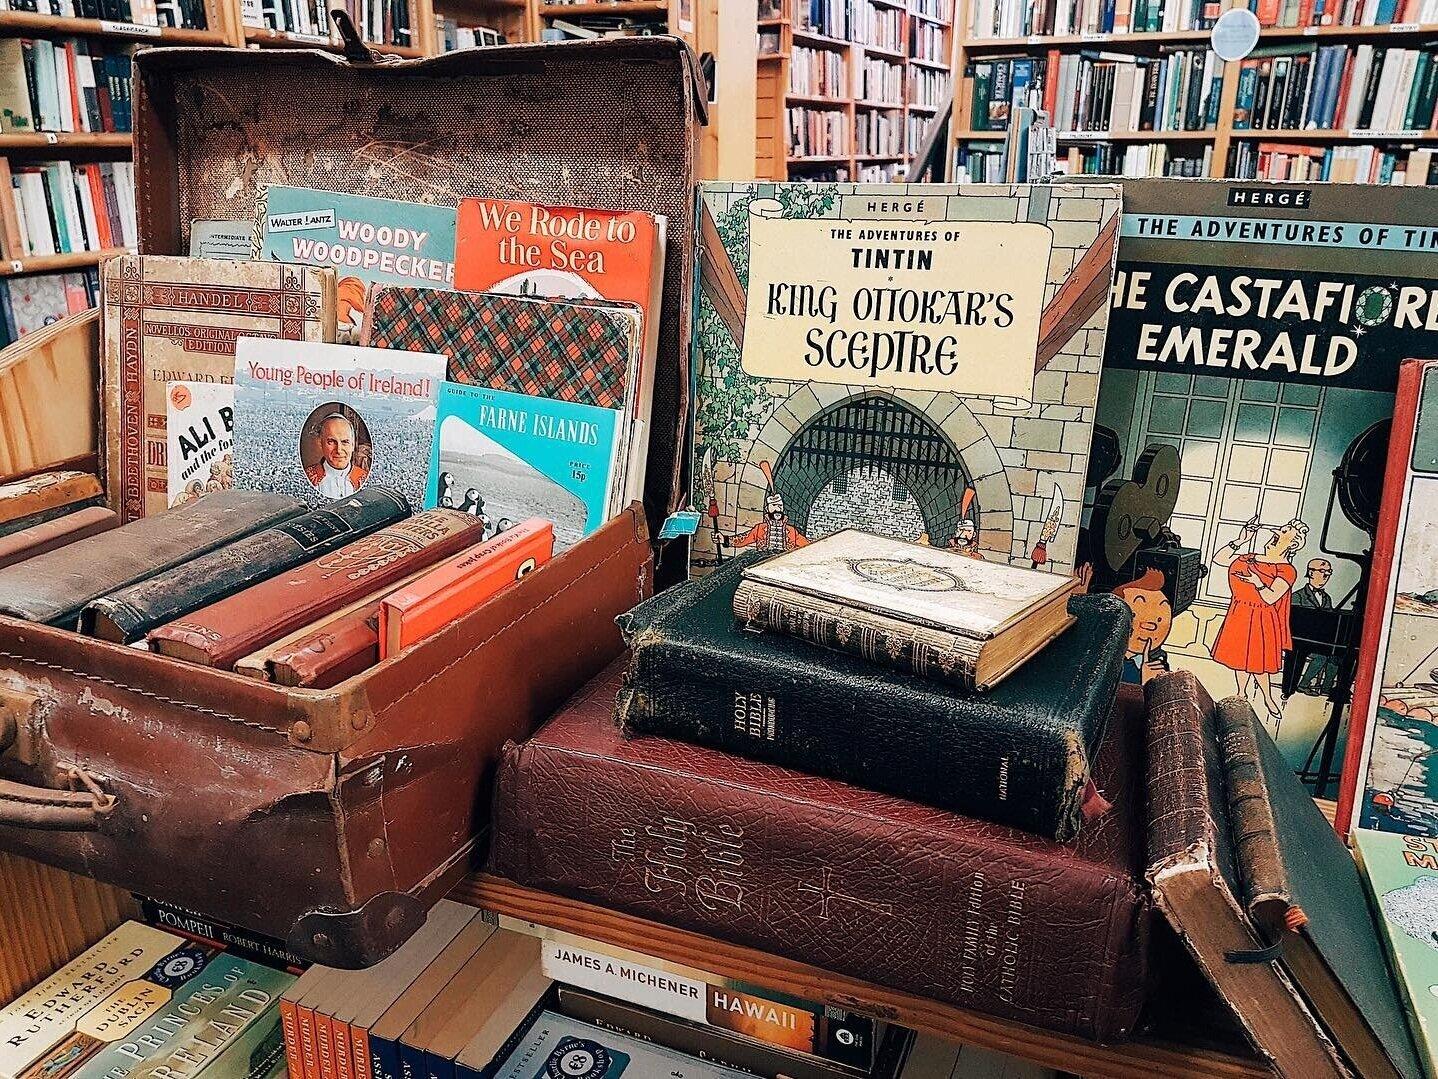 We take Books -